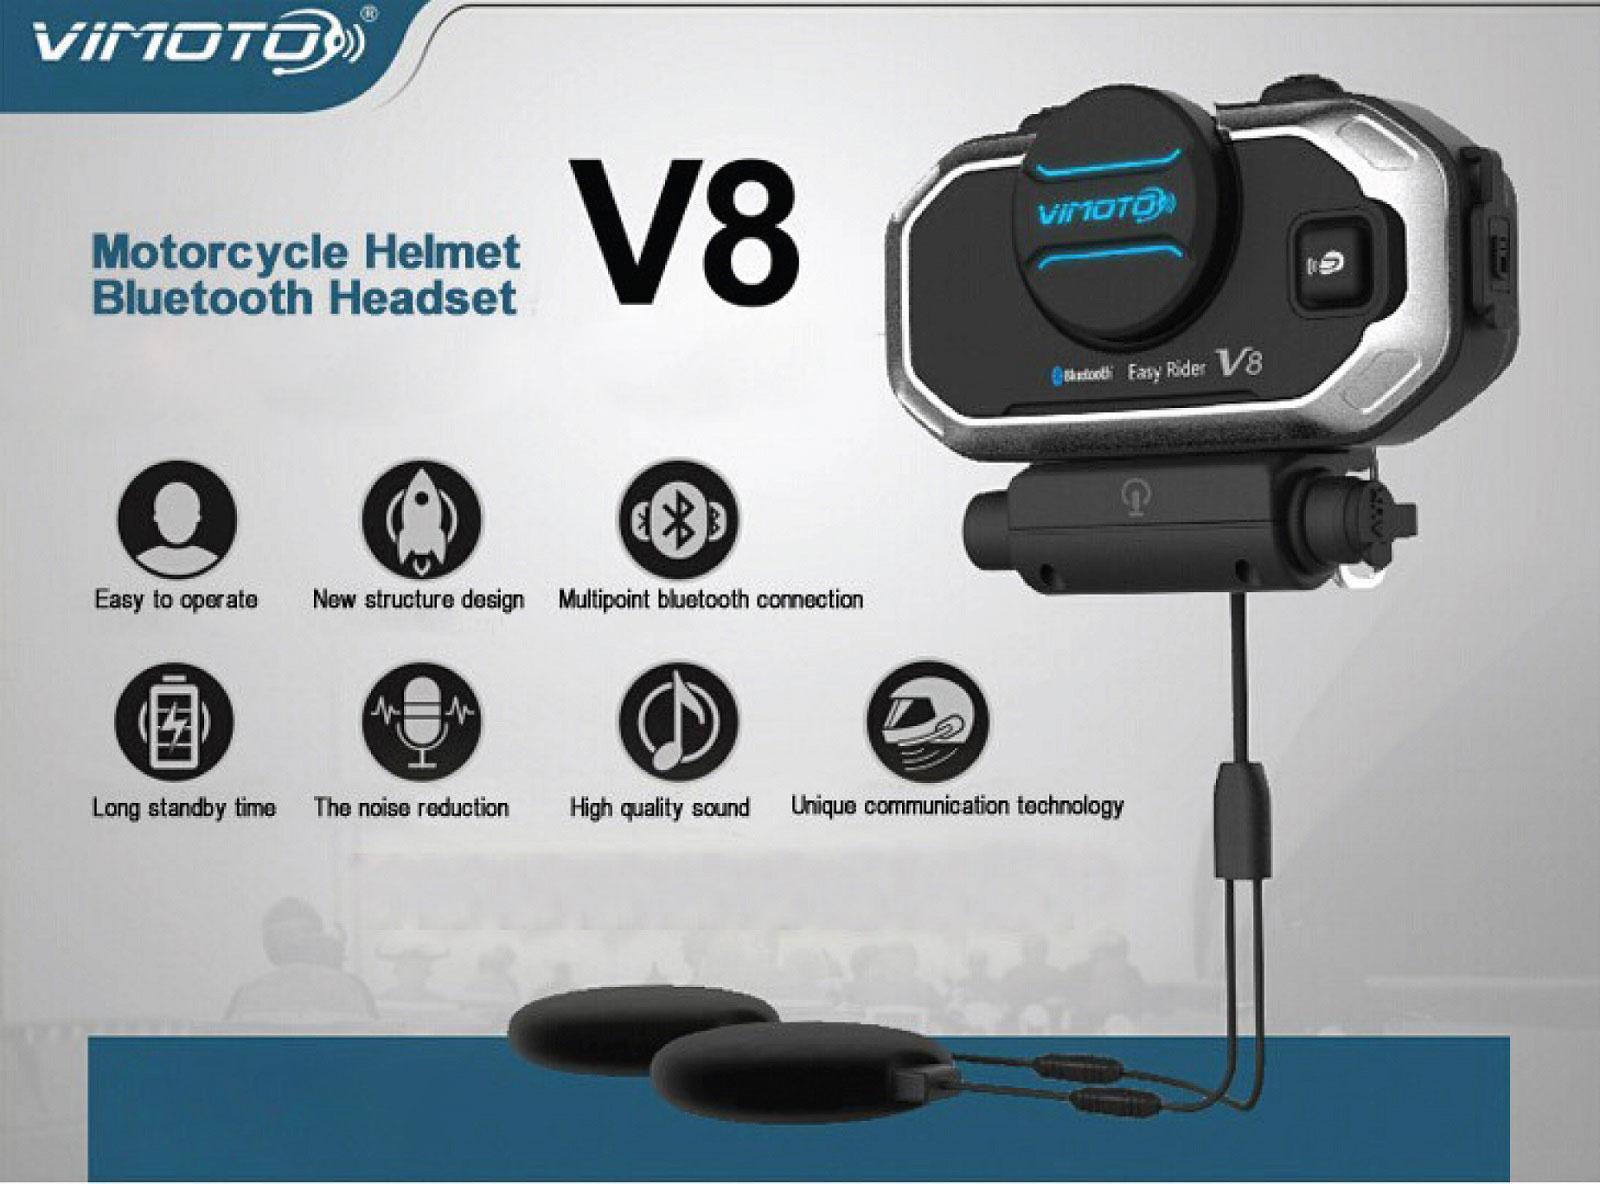 Motorcycle Bluetooth Headsets Shopping Guide Gearvita High Quality Intercom Vimoto V8